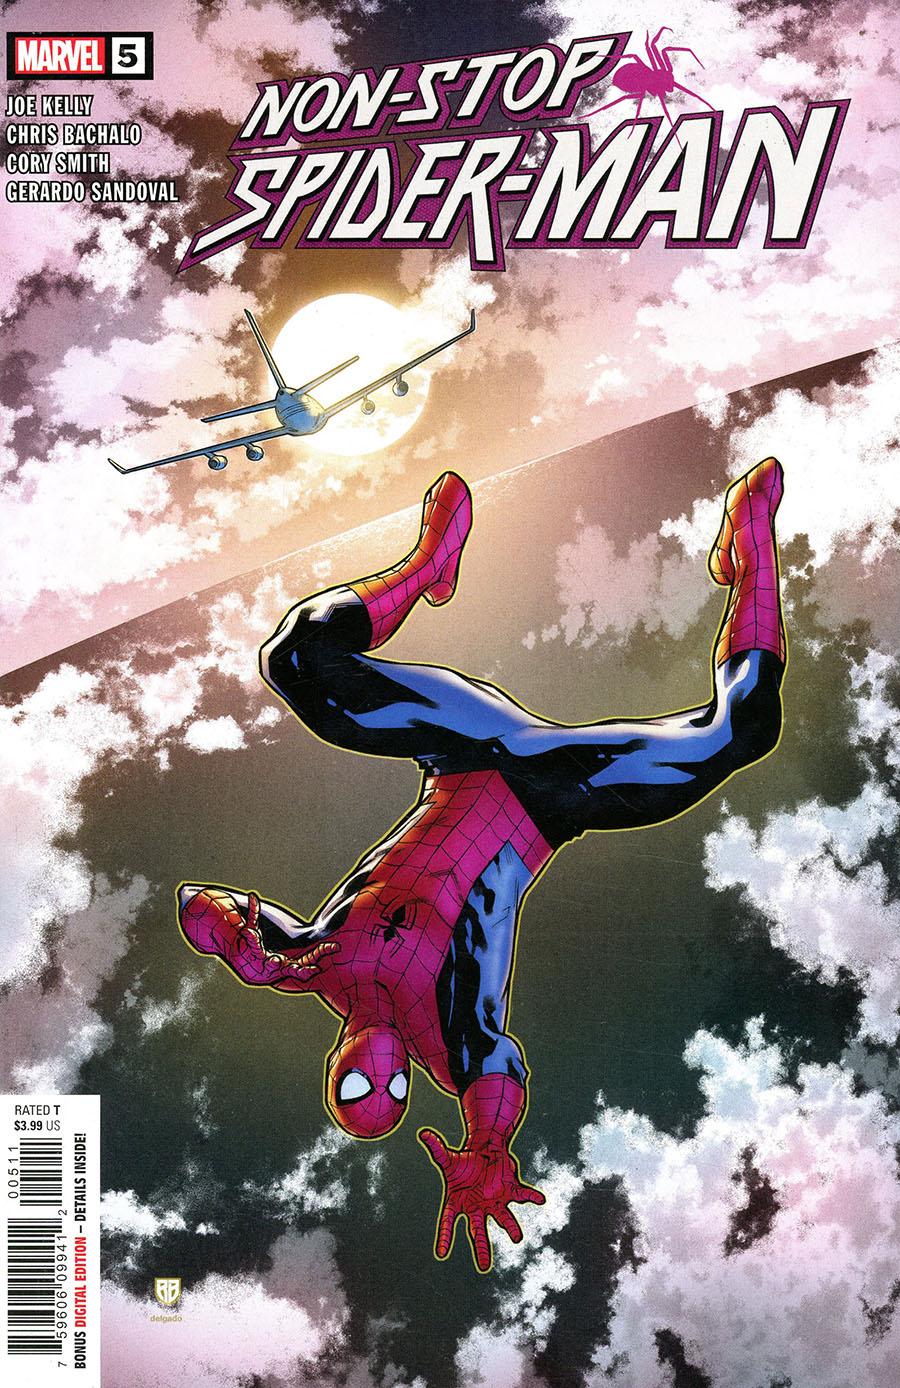 Non-Stop Spider-Man #5 Cover A Regular RB Silva Cover